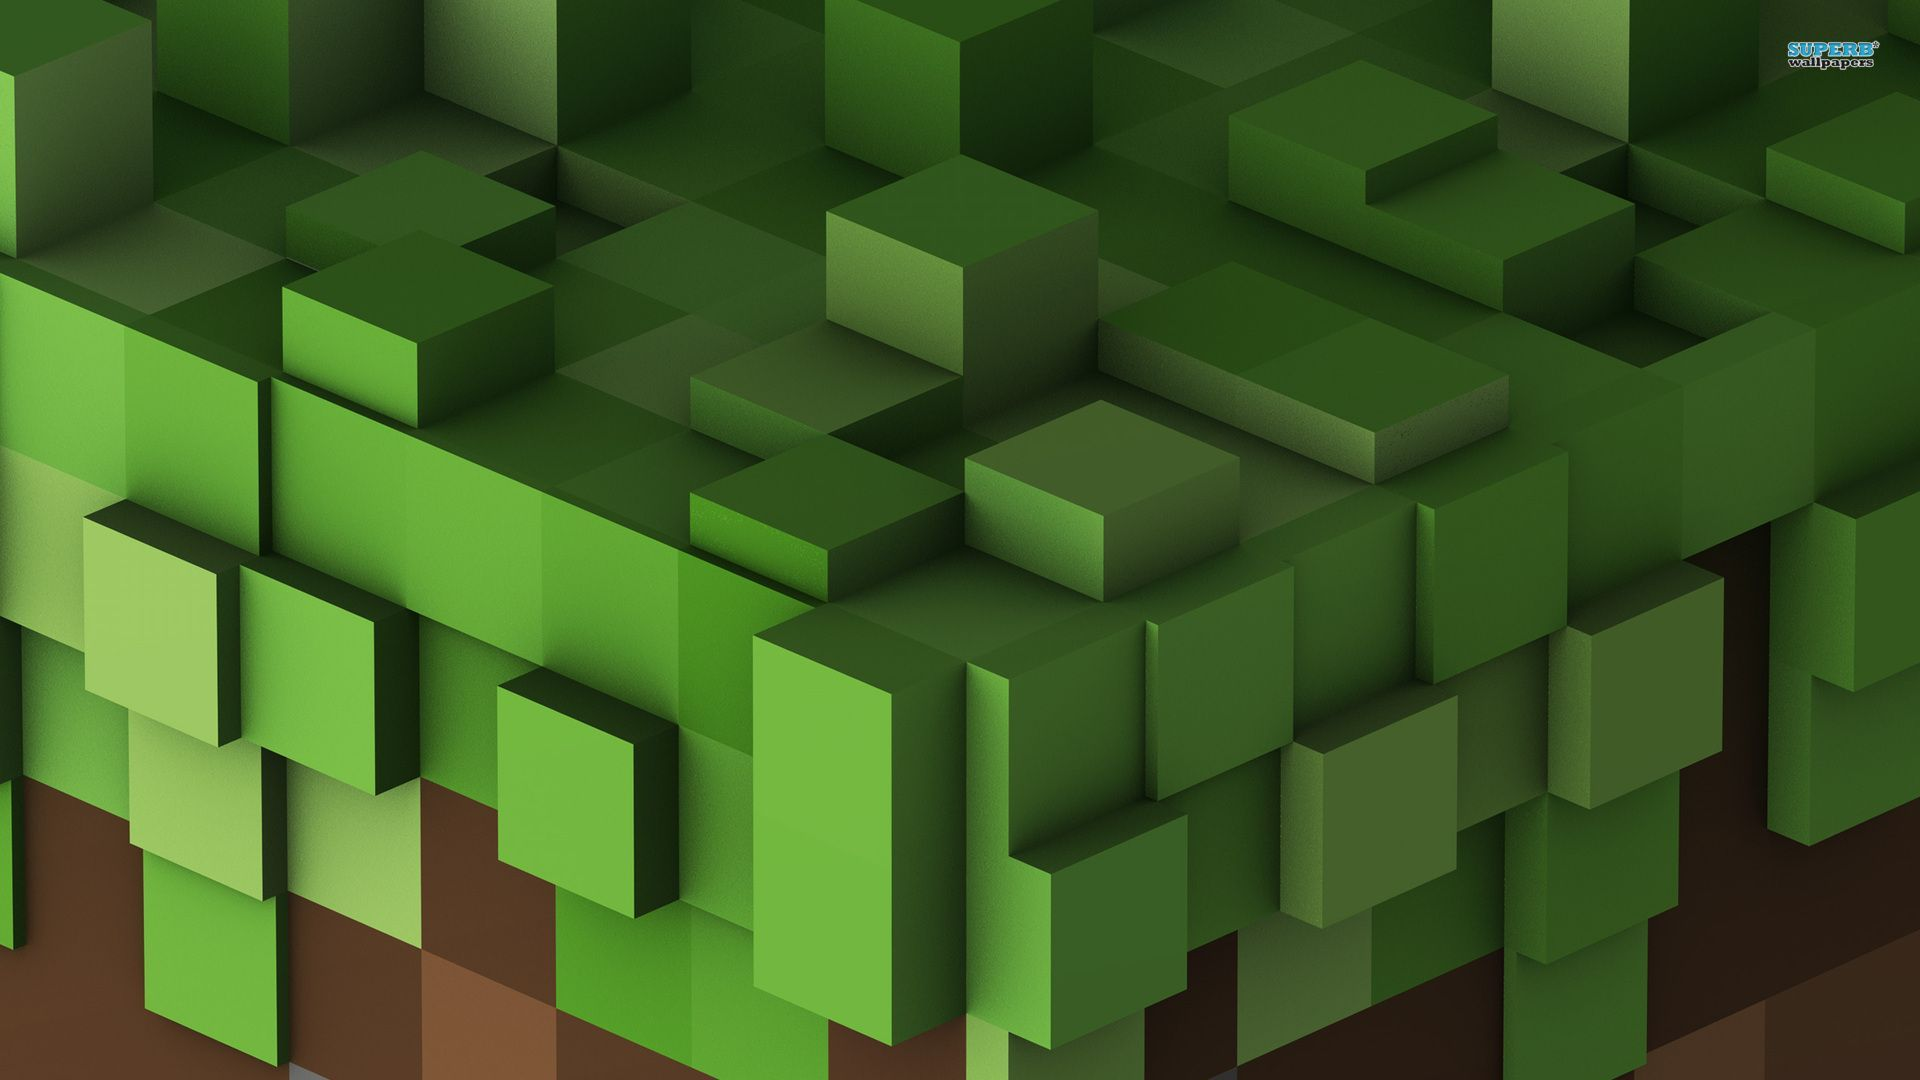 Minecraft Wallpapers Hd Sdeerwallpaper